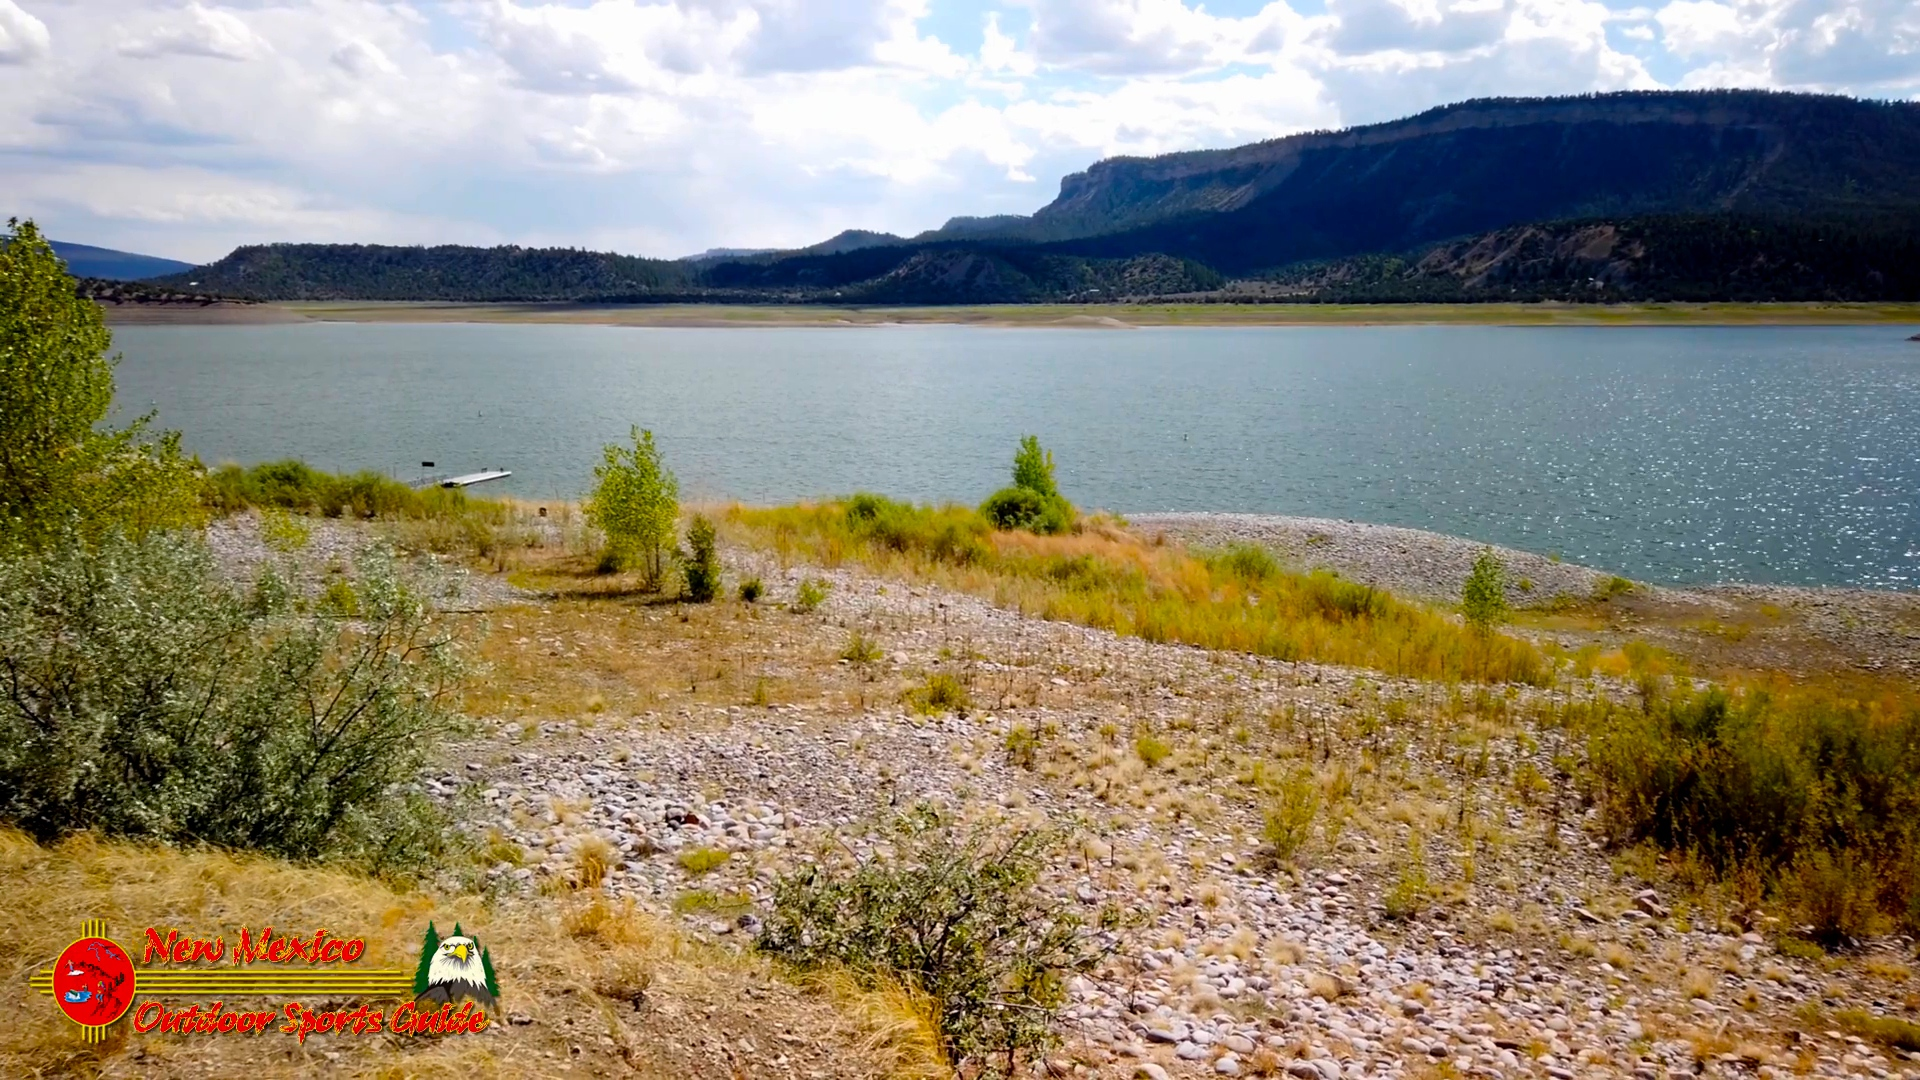 El-Vado-Lake-State-Park-Osmo-Pocket-07-14-2020-2